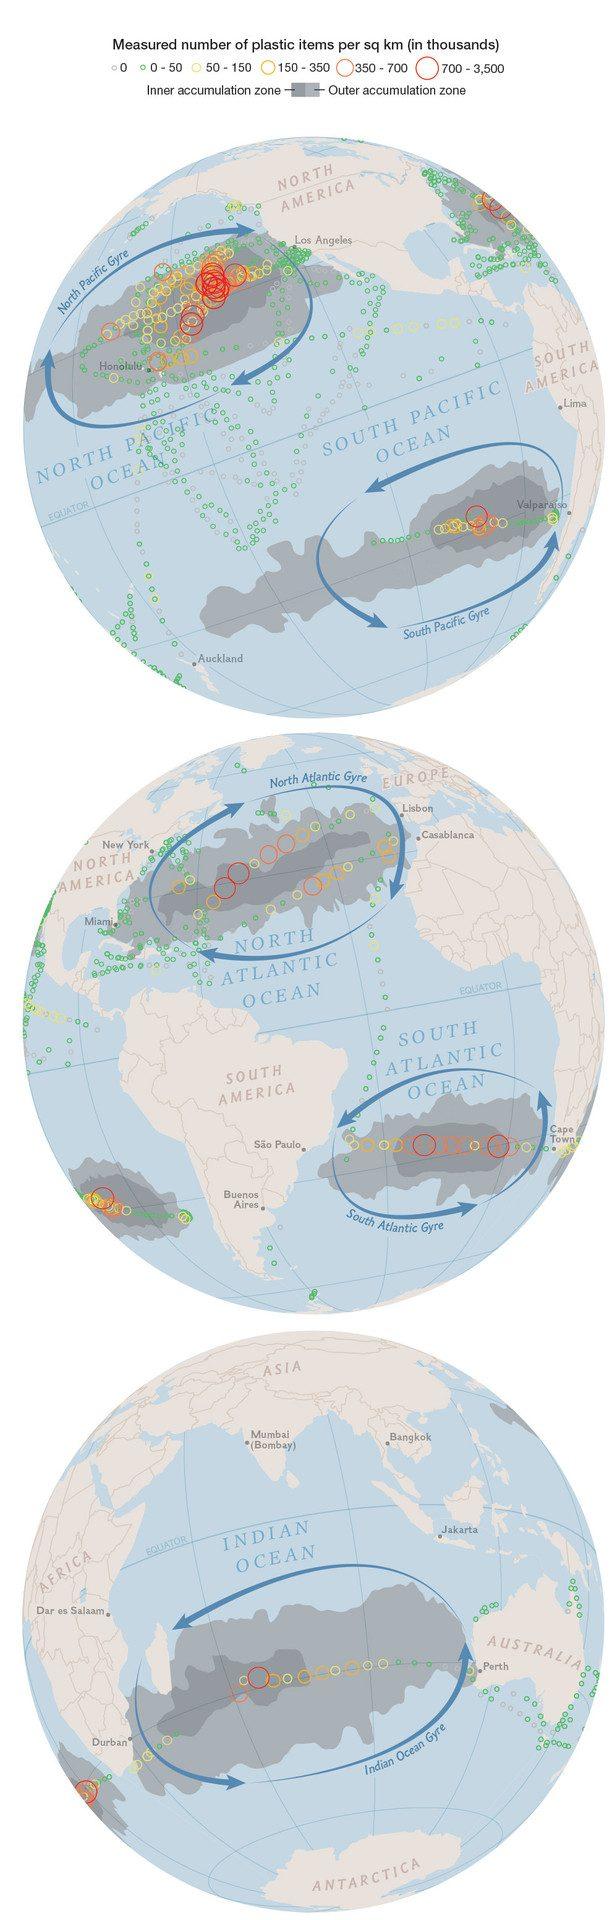 oceanipattumiere